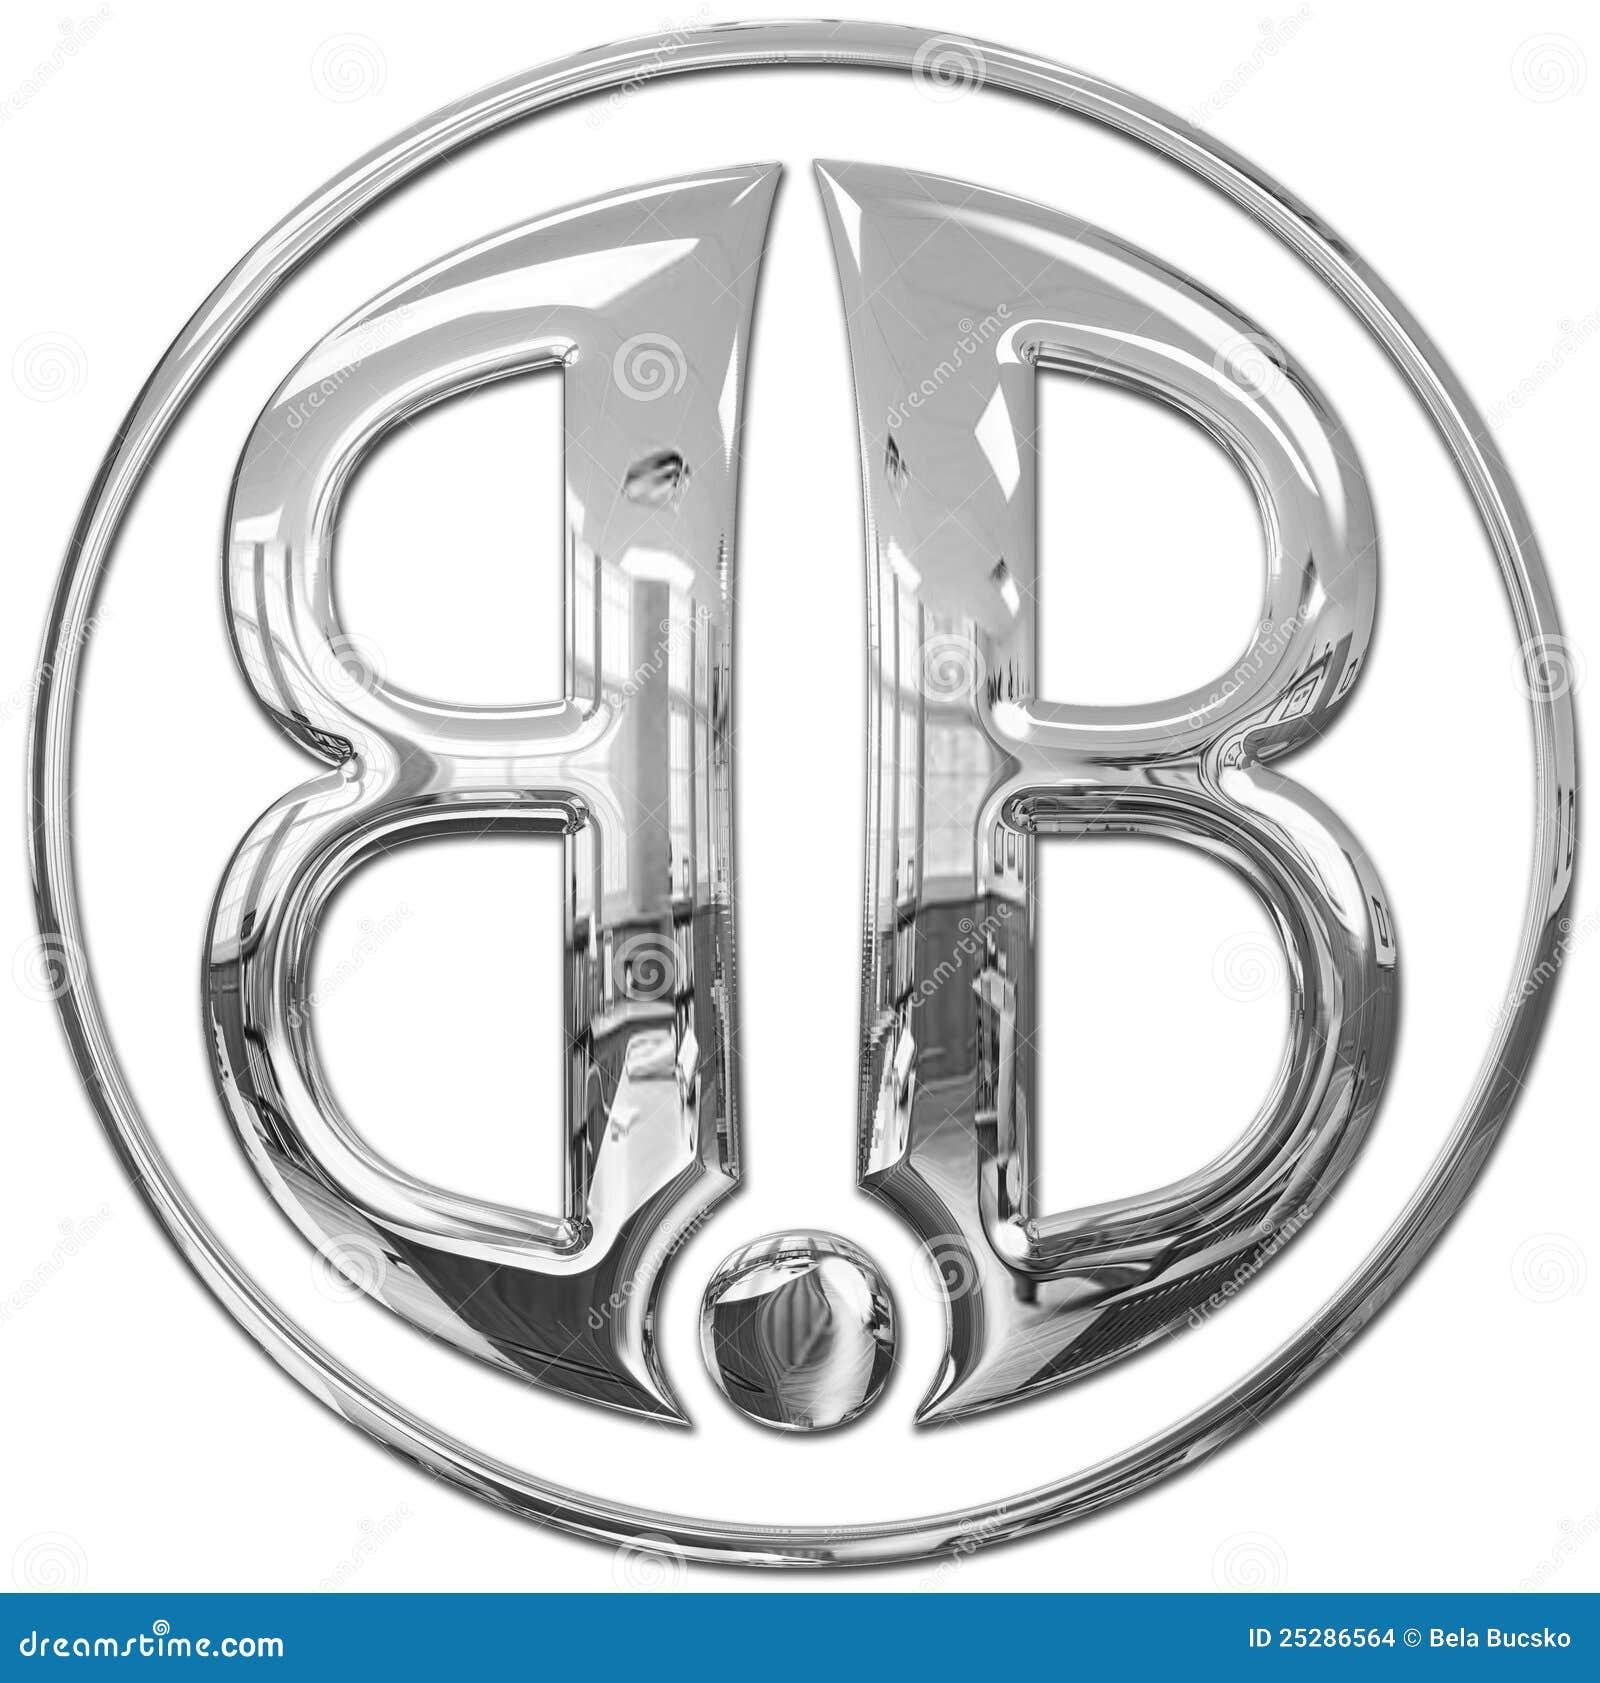 Bb logo stock images image 25286564 for Logo bb